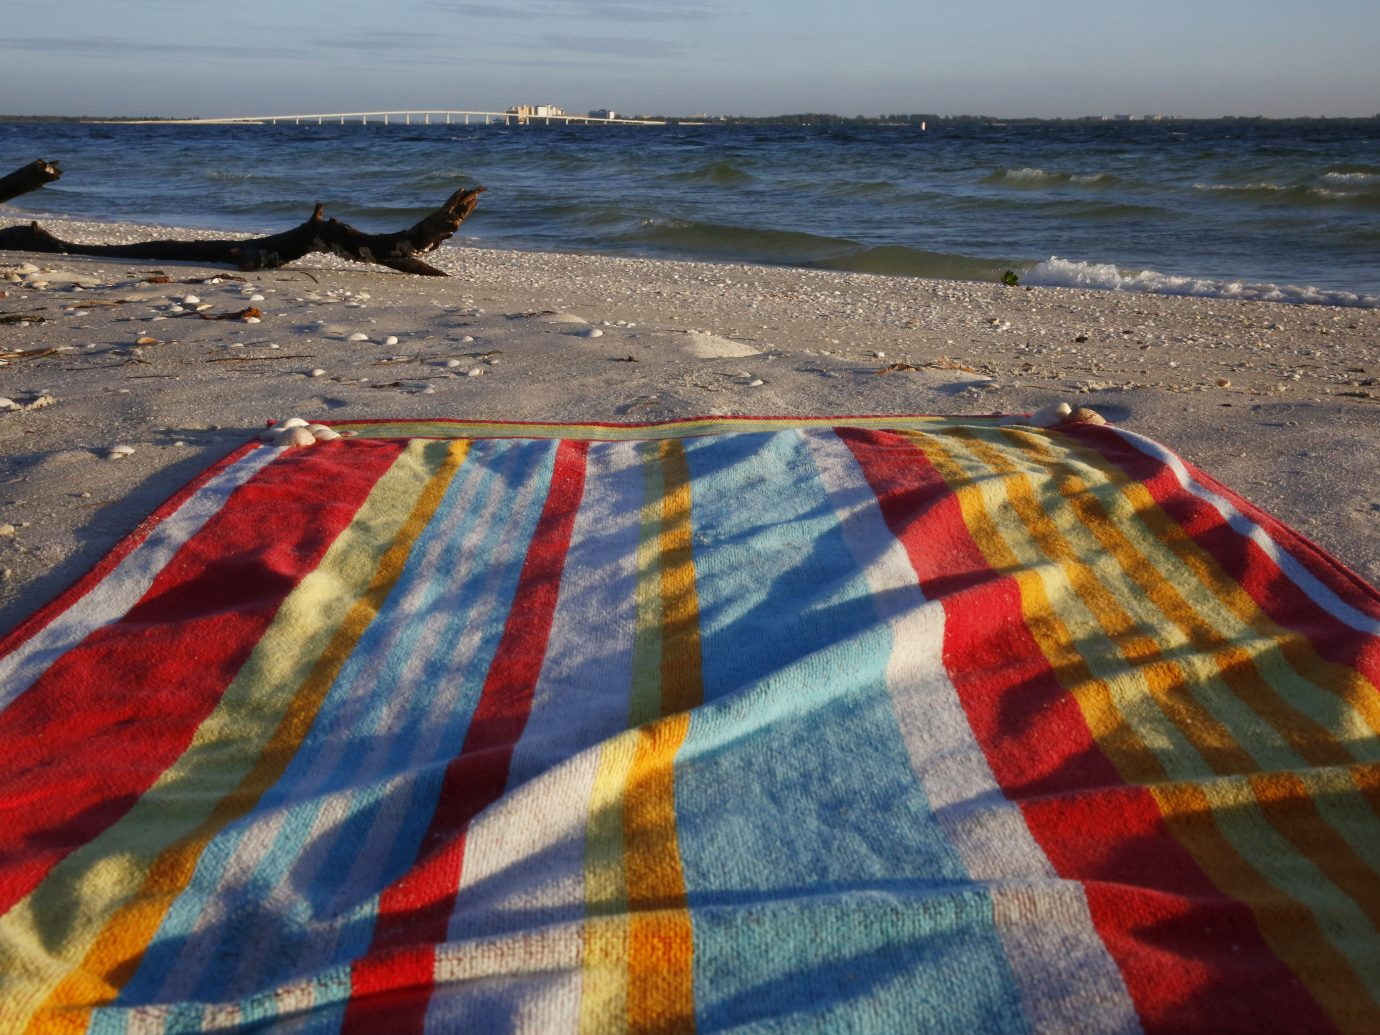 Trip Ideas sky Beach outdoor color Sea Coast Ocean colorful sand material shore colored sandy